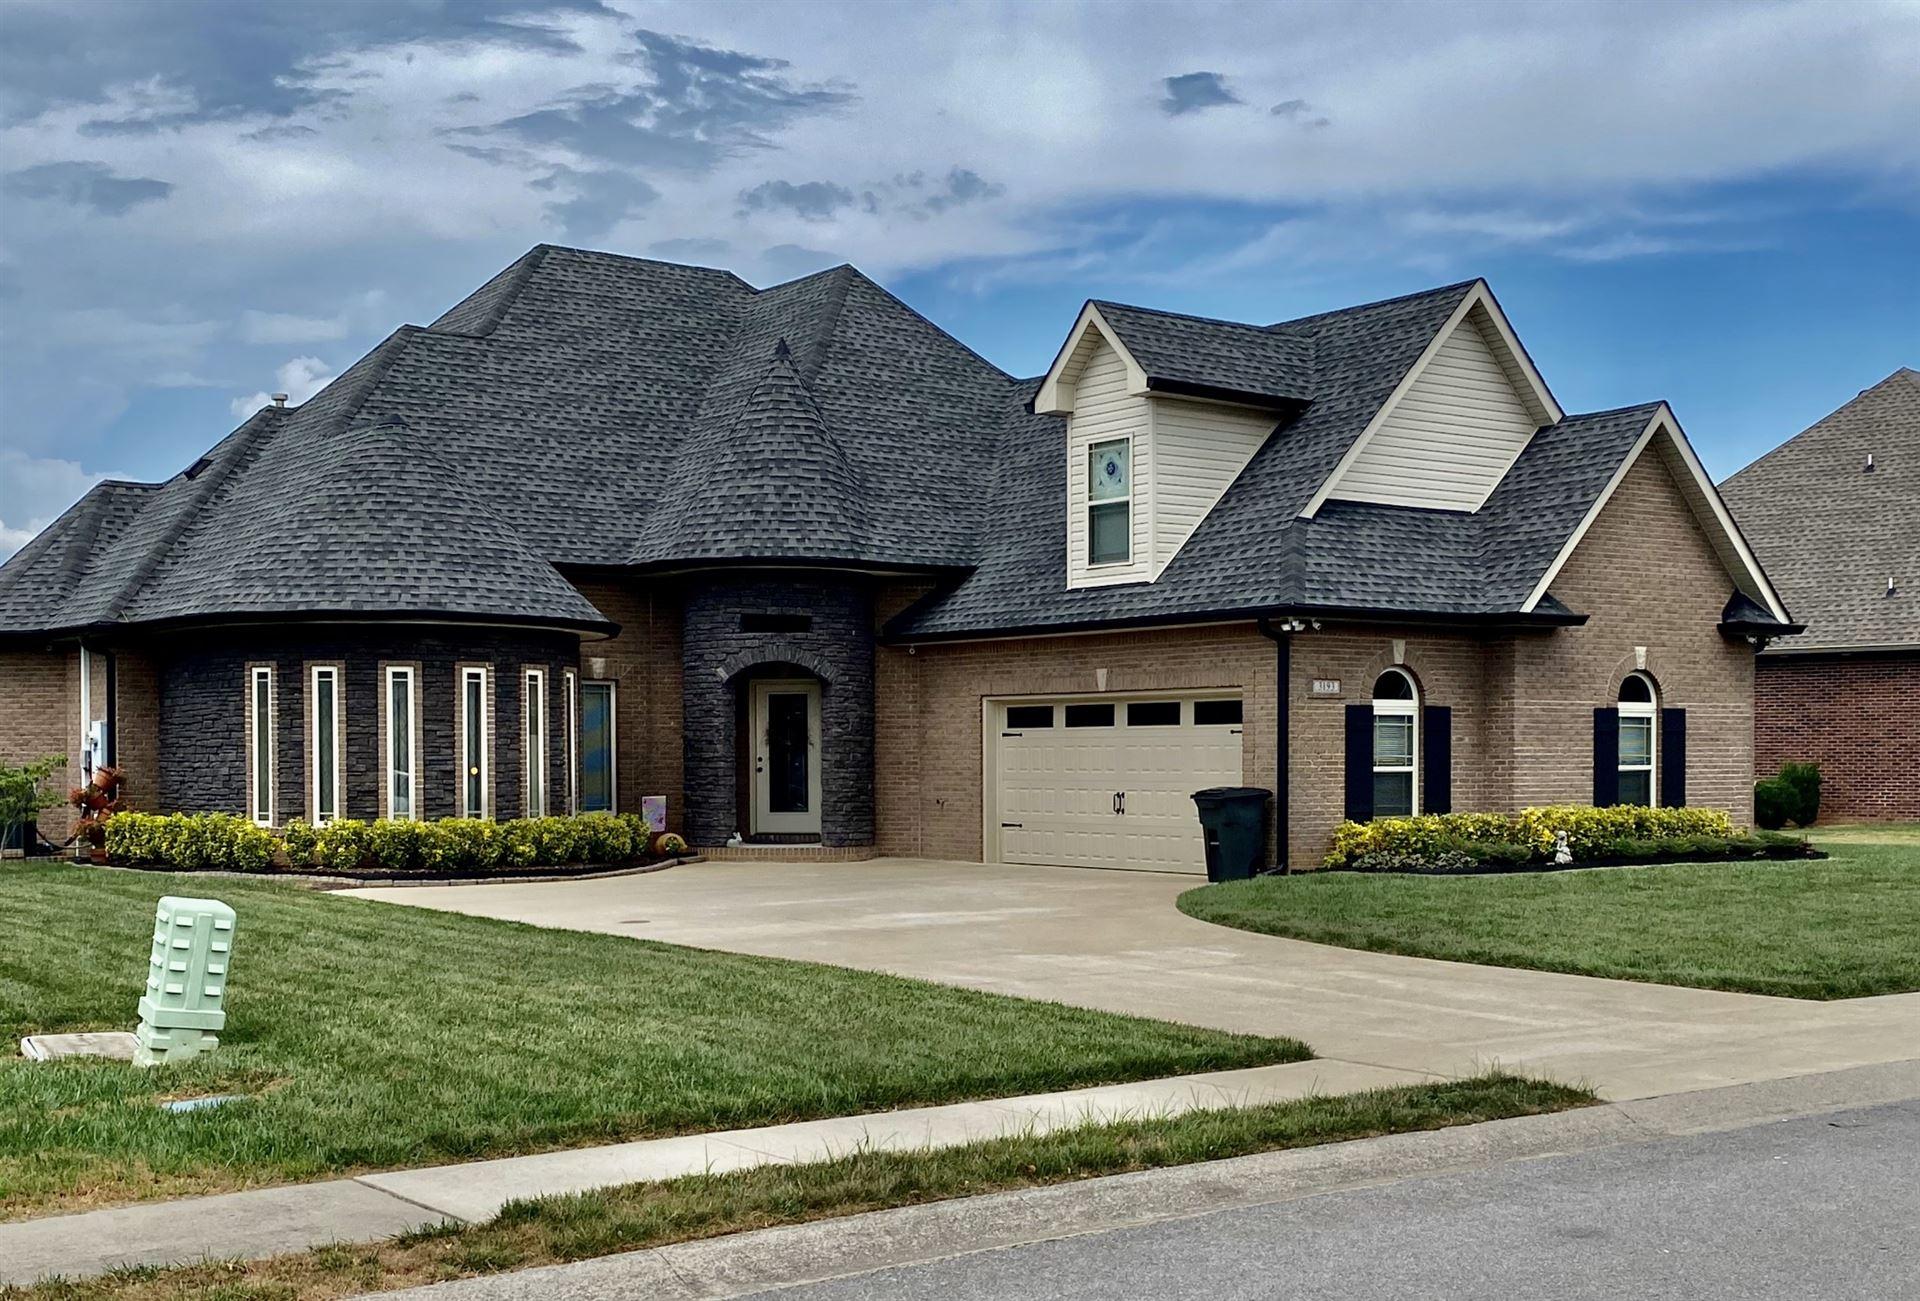 3193 Porter Hills Dr, Clarksville, TN 37043 - MLS#: 2172880